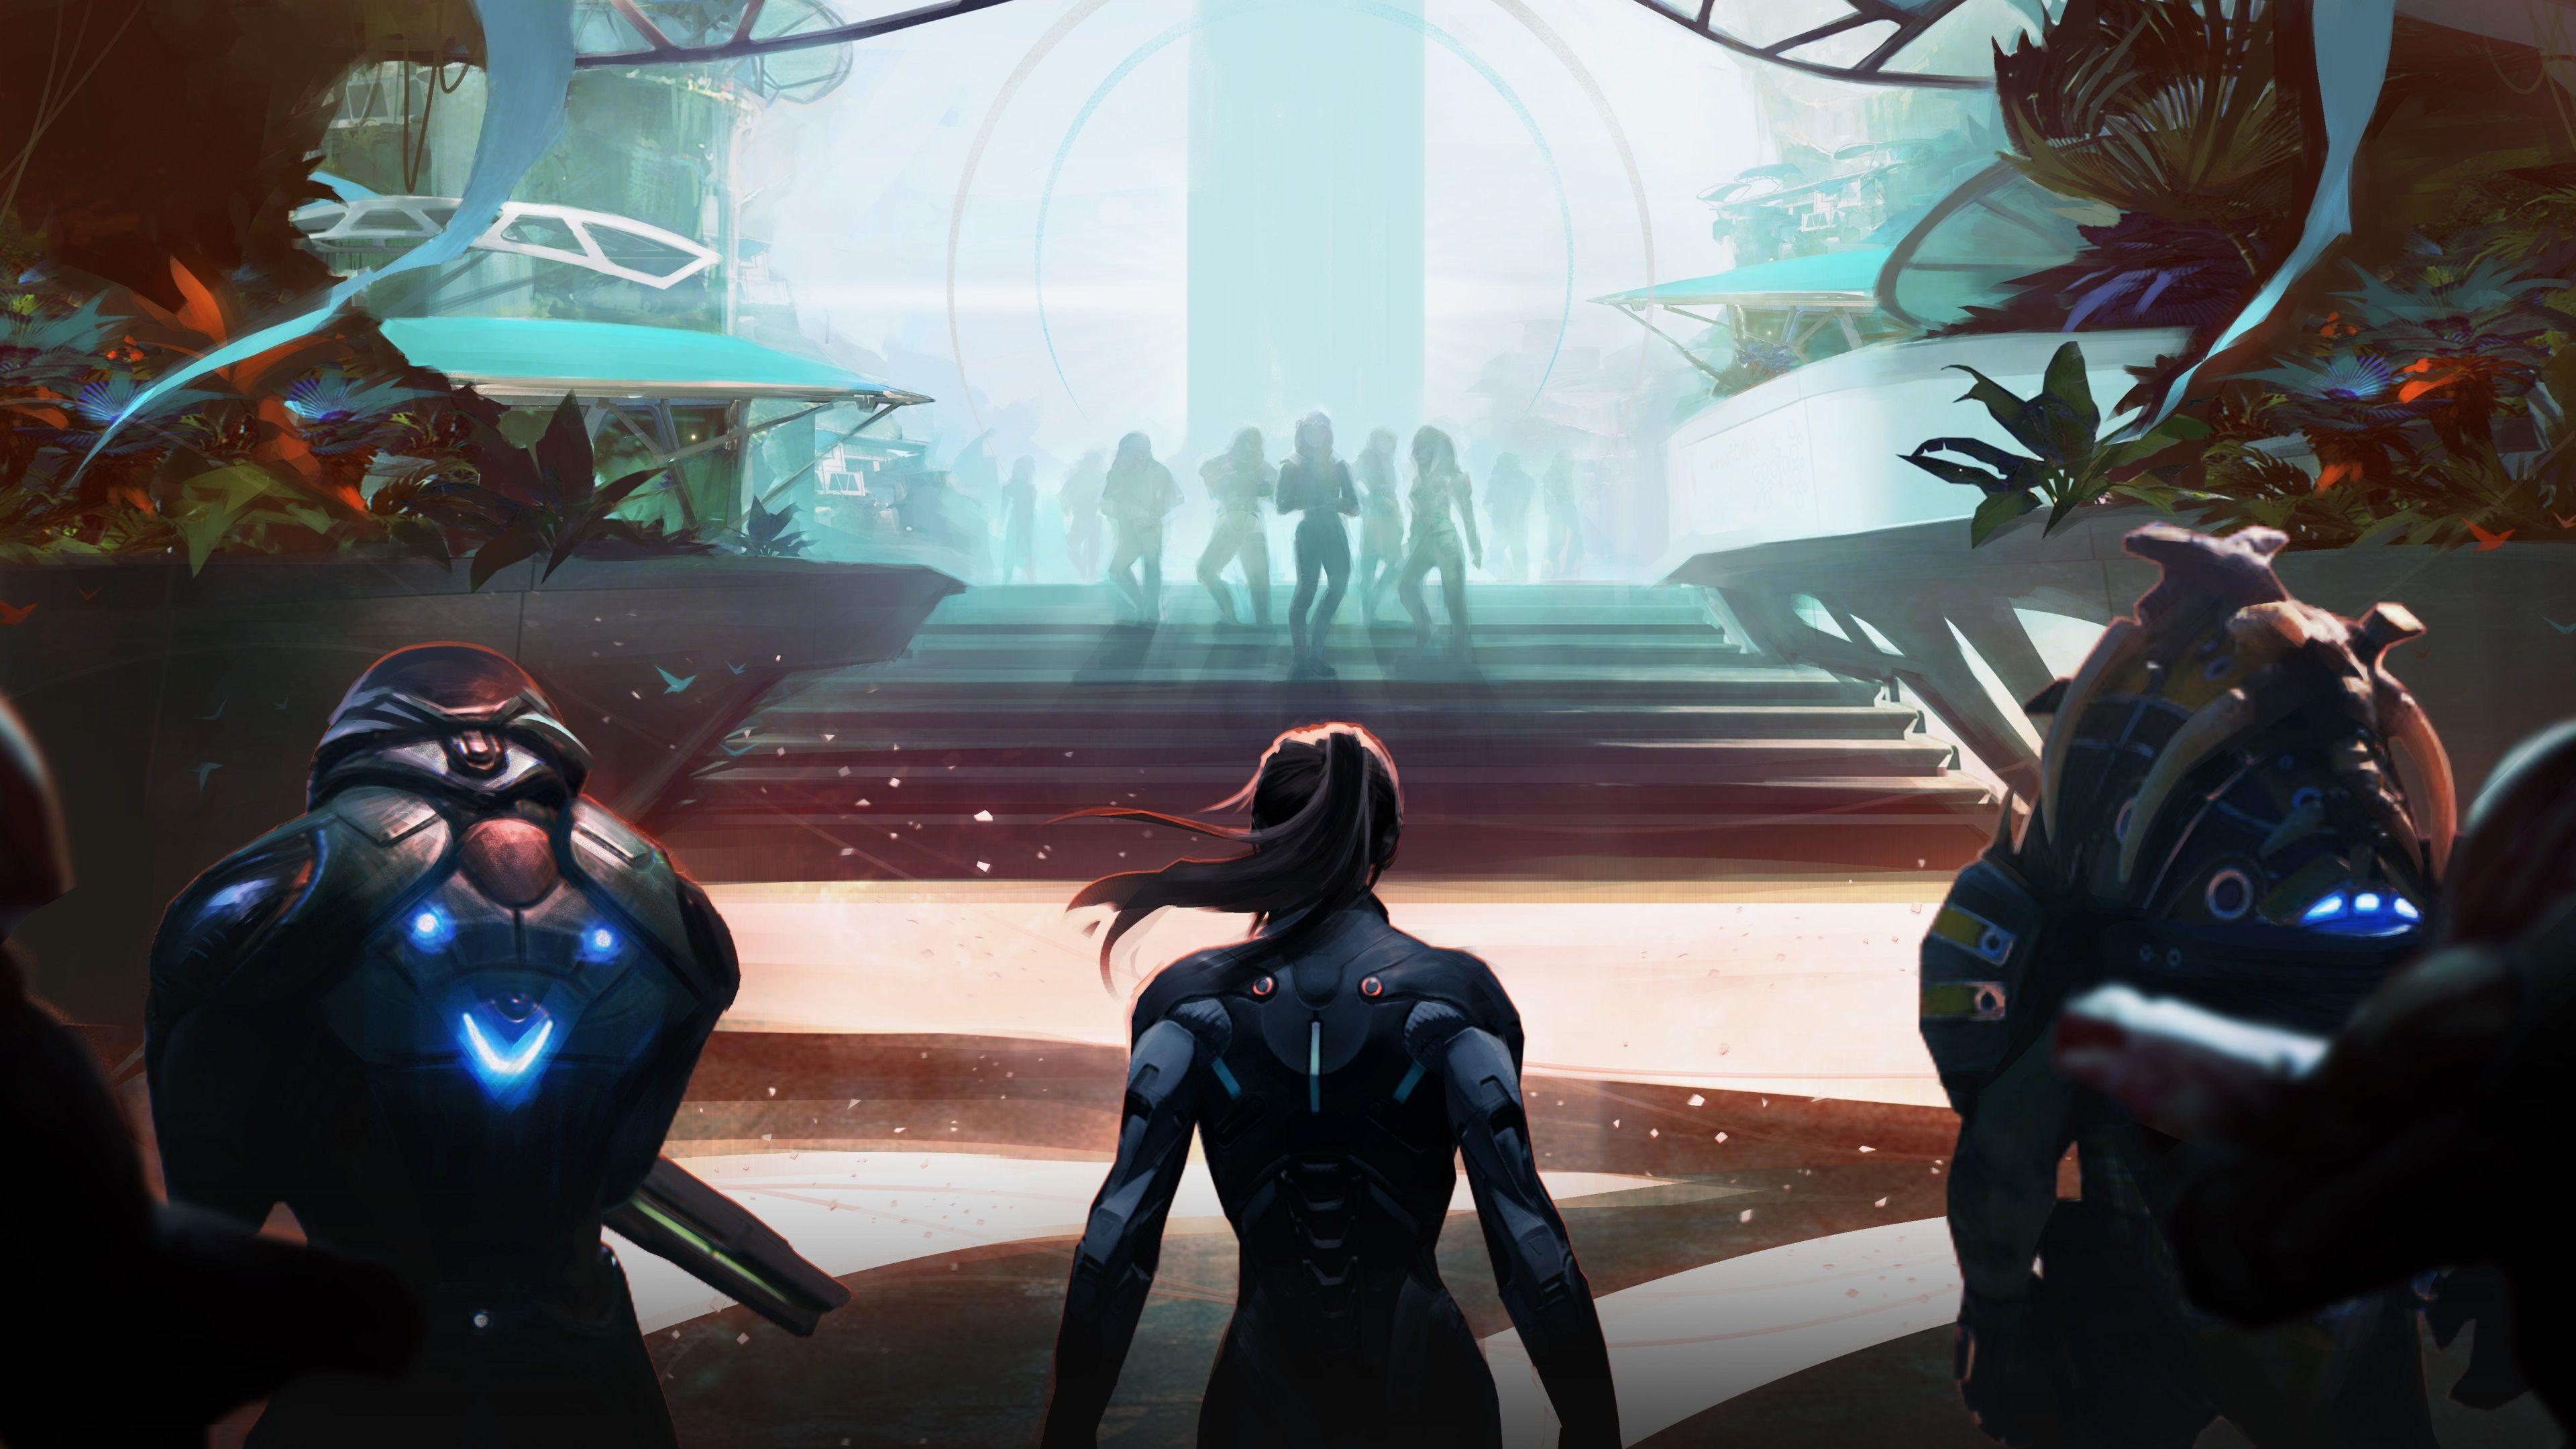 3840x2160 Mass Effect Andromeda 4k Desktop Wallpaper Hd Quality